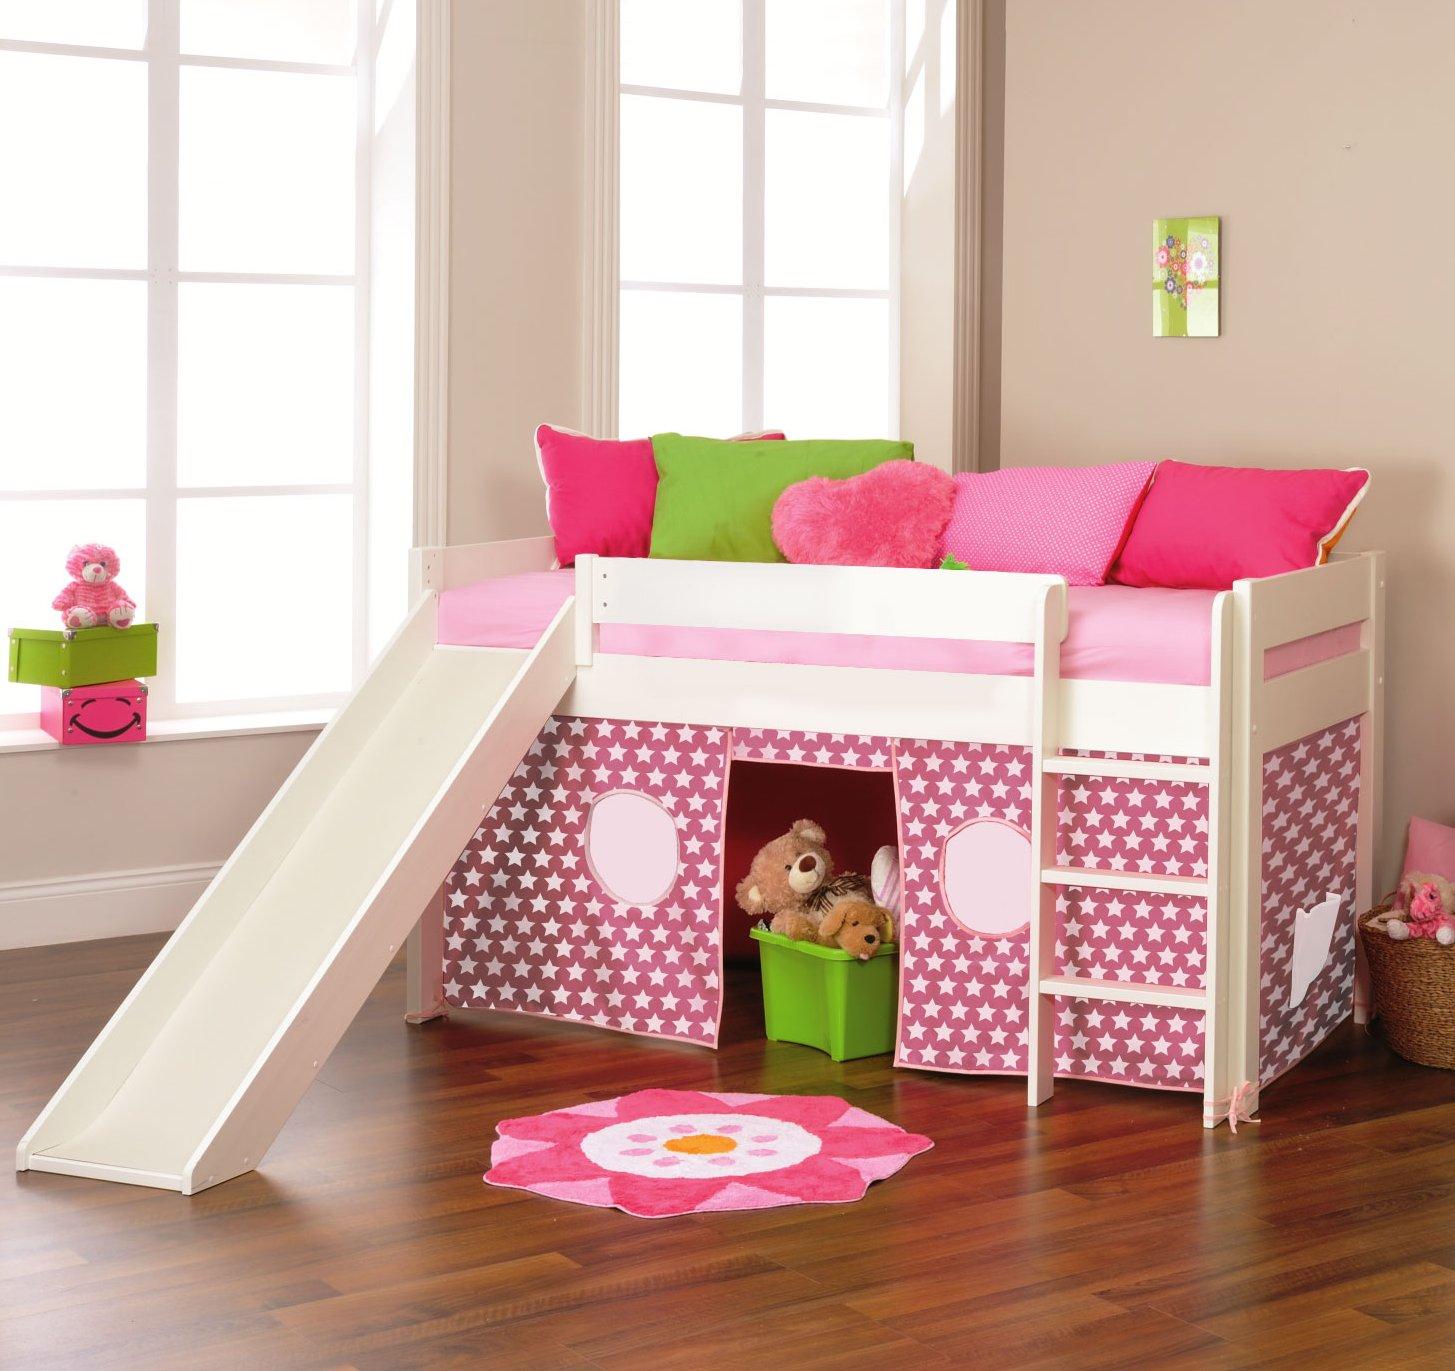 bedroom fun. Play 3 Midsleeper Bed With Slide \u0026 Tent (Pink Star) By STOMPA Bedroom Fun